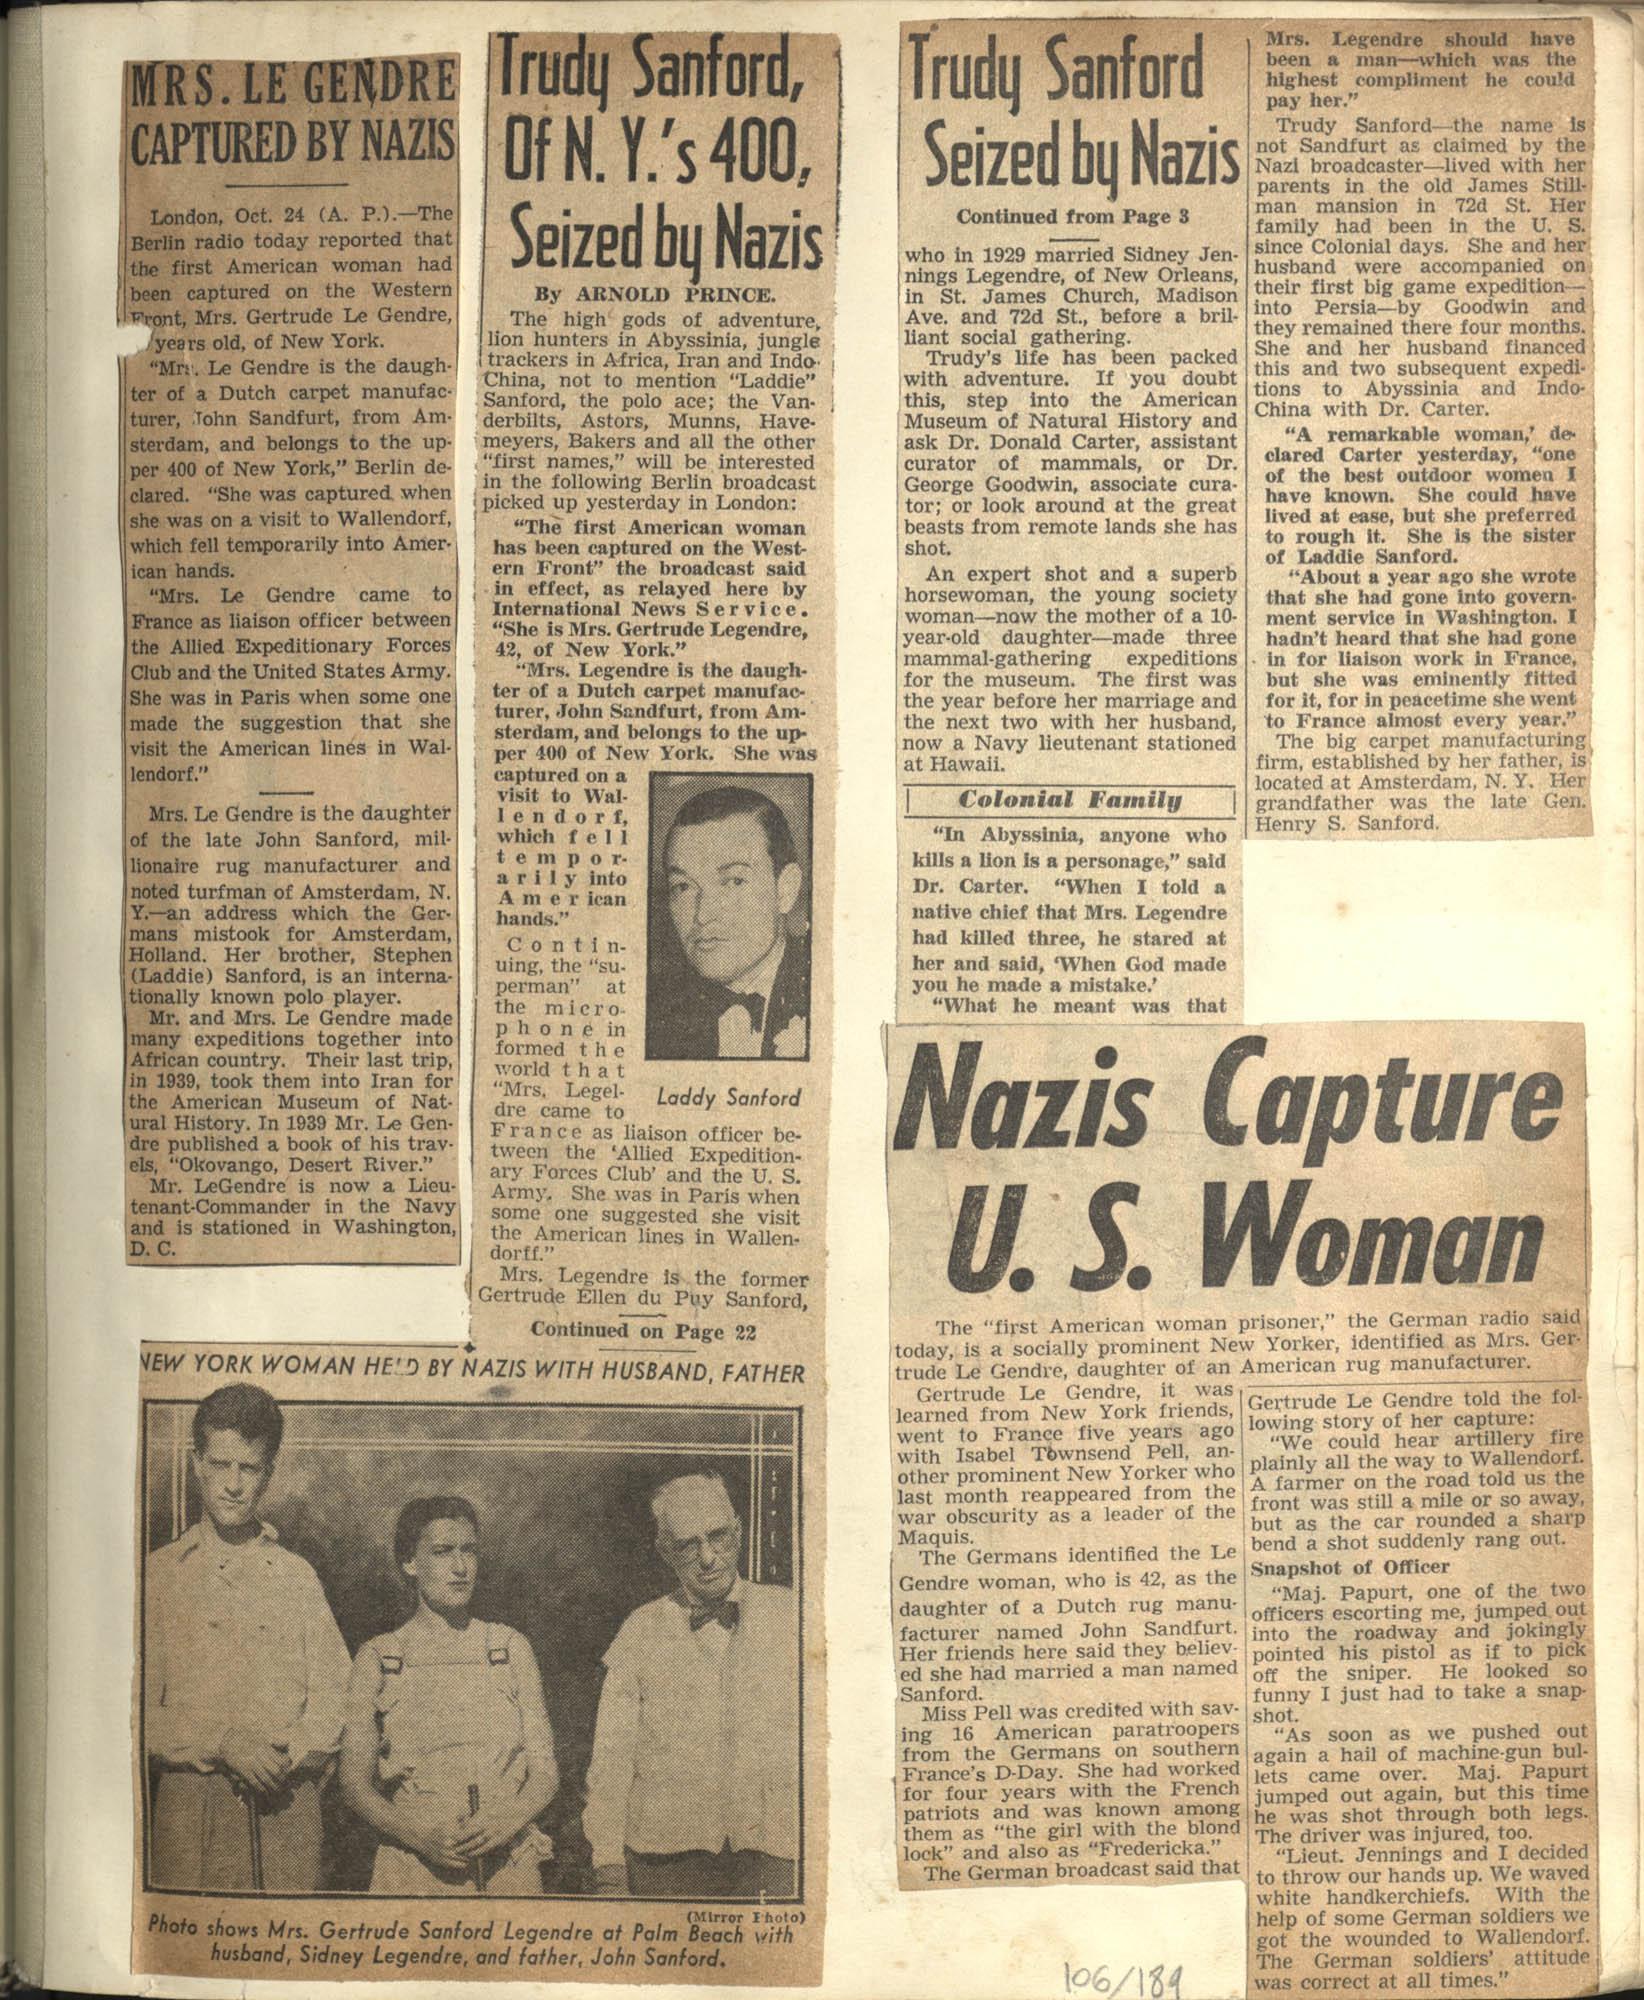 Gertrude Legendre OSS Scrapbook, 1944, Page 106